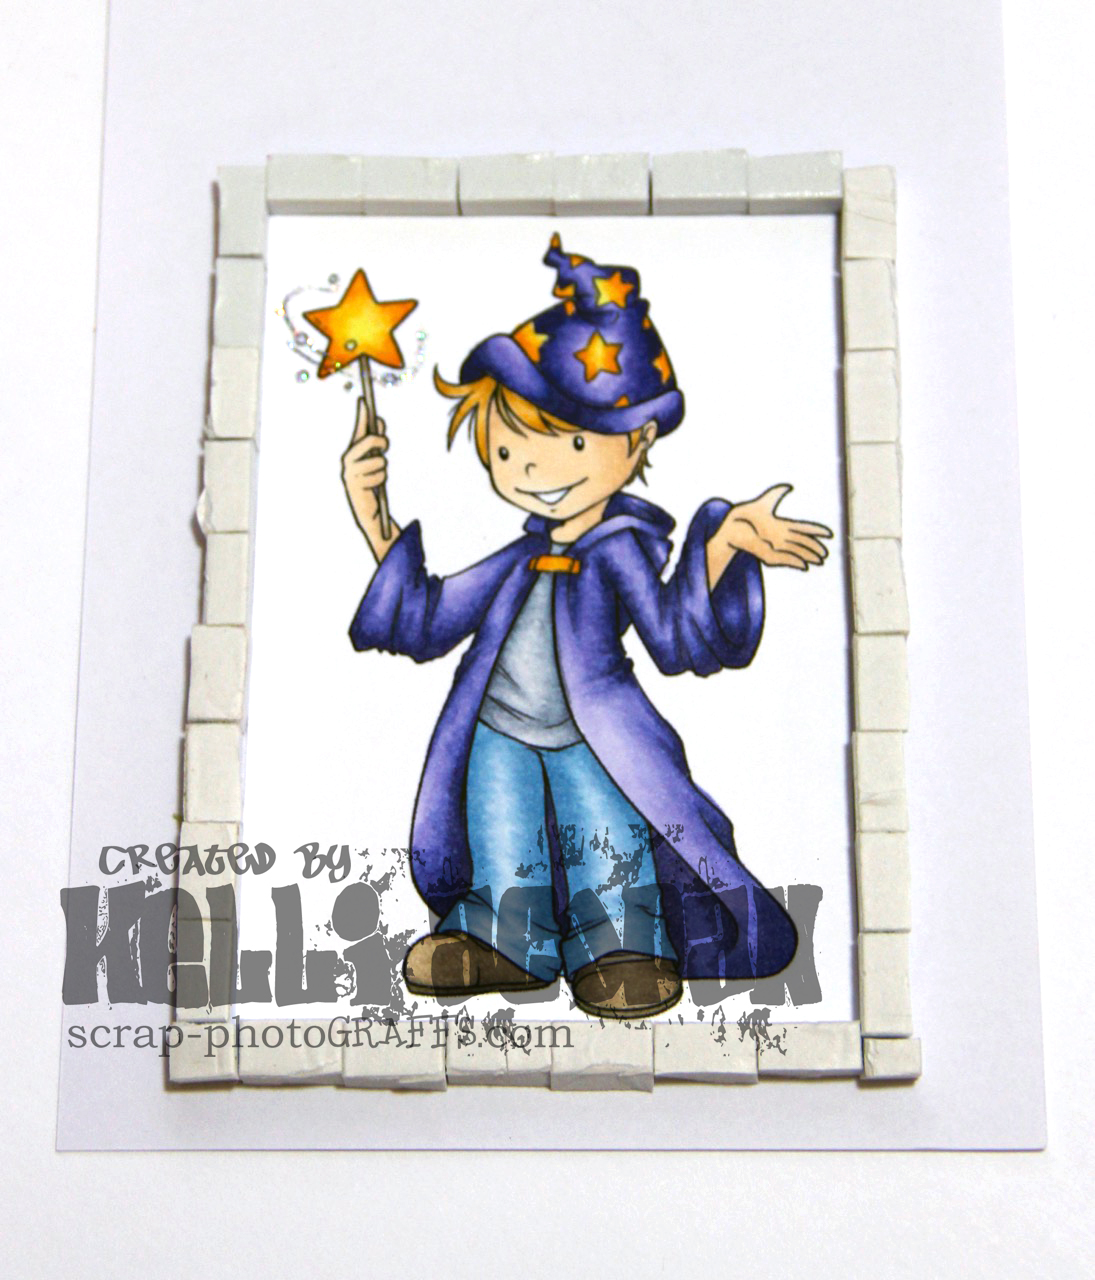 http://4.bp.blogspot.com/-pHYL9tUeCjY/VpiSv1eeR9I/AAAAAAAAFDU/giw6Lce1wBg/s1600/CraftySentimentsDesigns-WizardCharlie-Tutorial-01-kelA.jpg